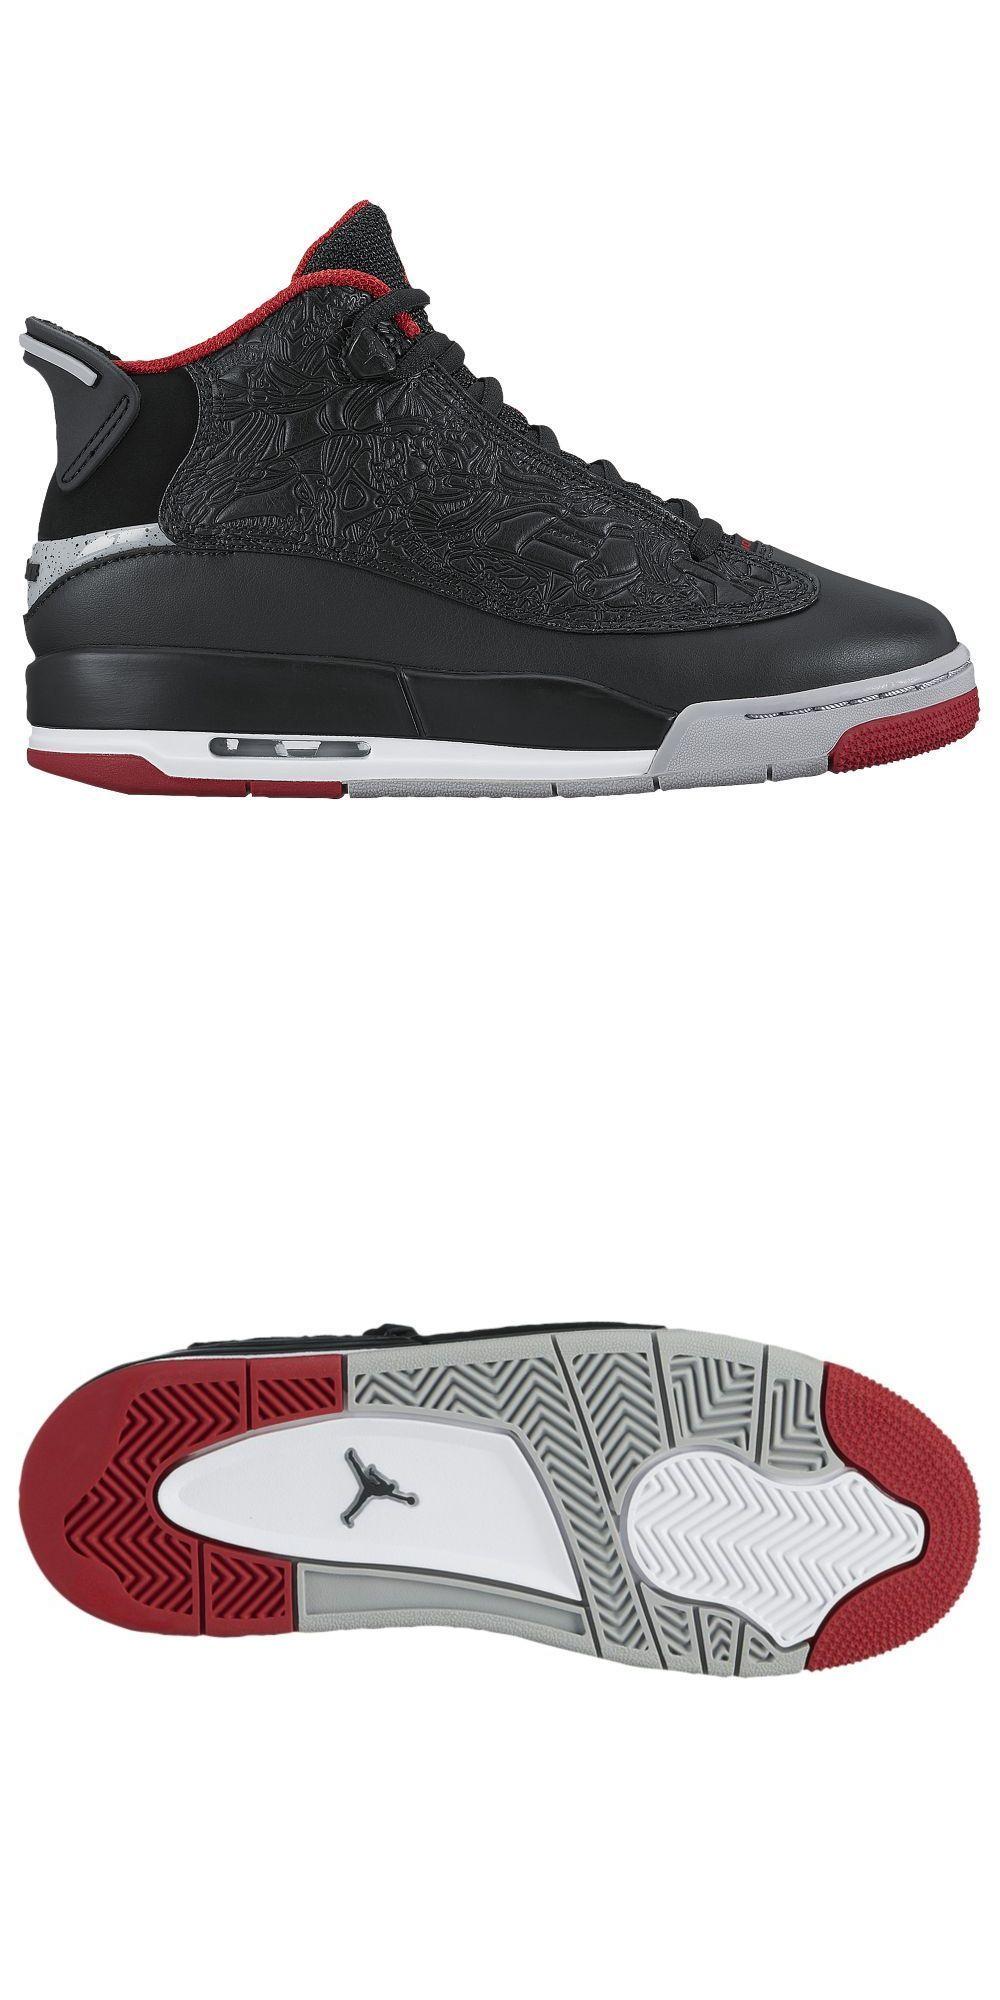 76fa47ddfb Boys Shoes 57929: Nike Air Jordan Dub Zero (Size 5 Youth) Oreo Black Wolf Grey  White 311047-013 -> BUY IT NOW ONLY: $74 on eBay!